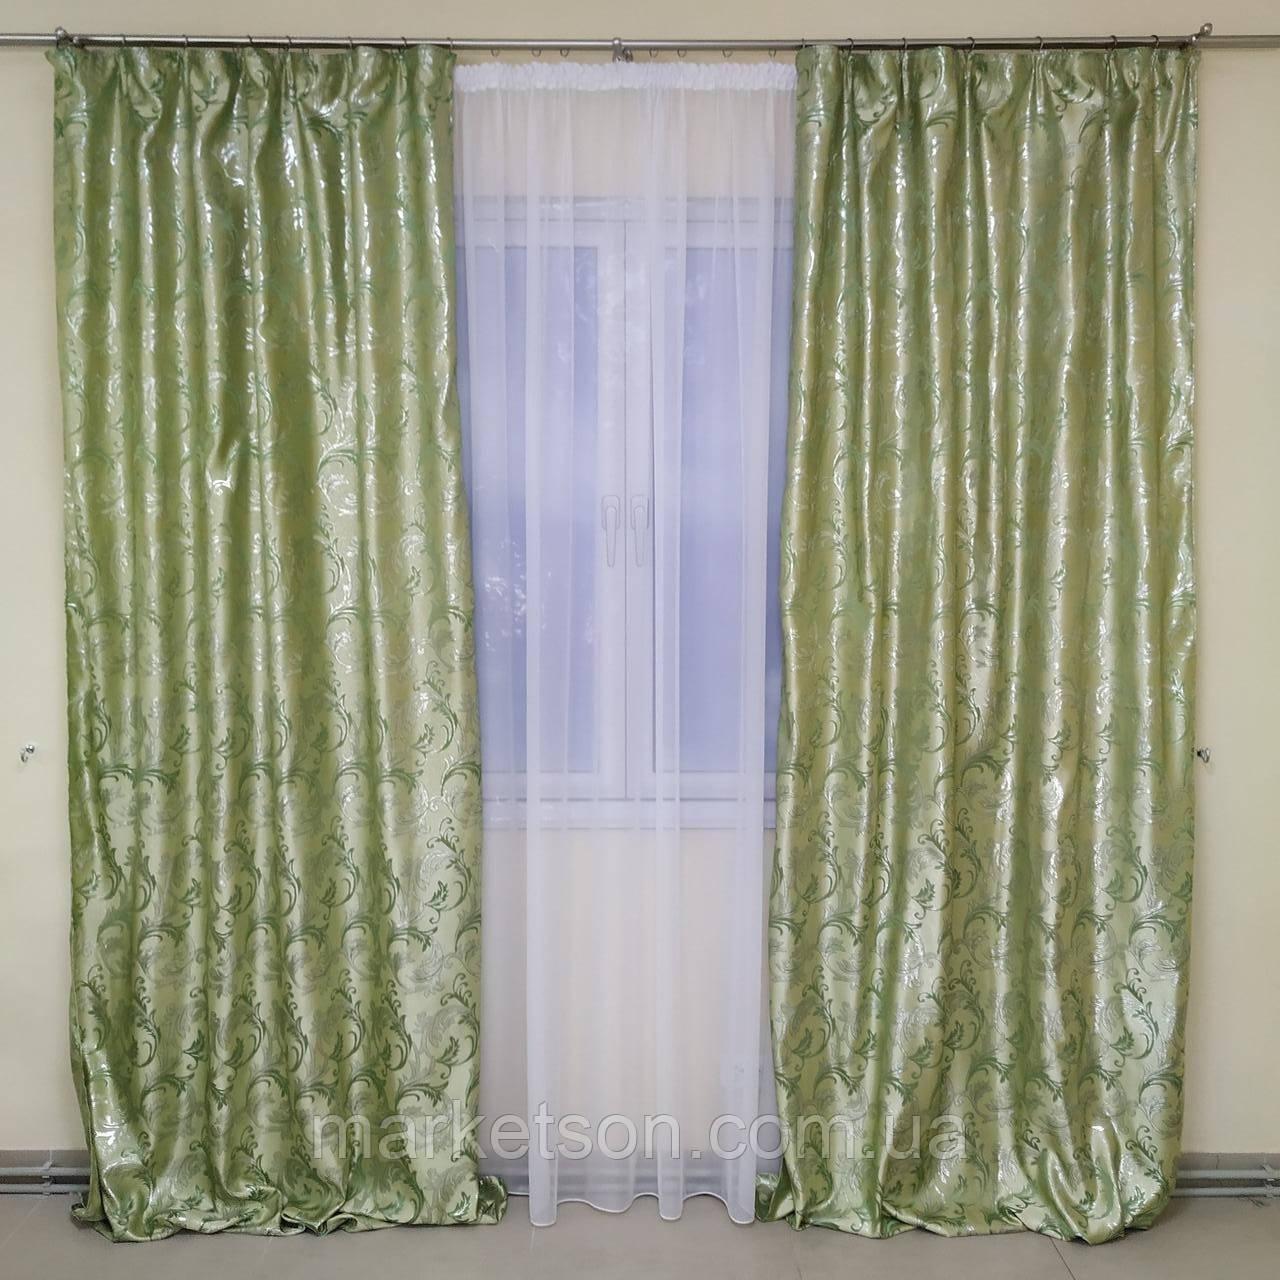 Готові штори 1,5х2,7м для спальні або вітальні з жаккарда